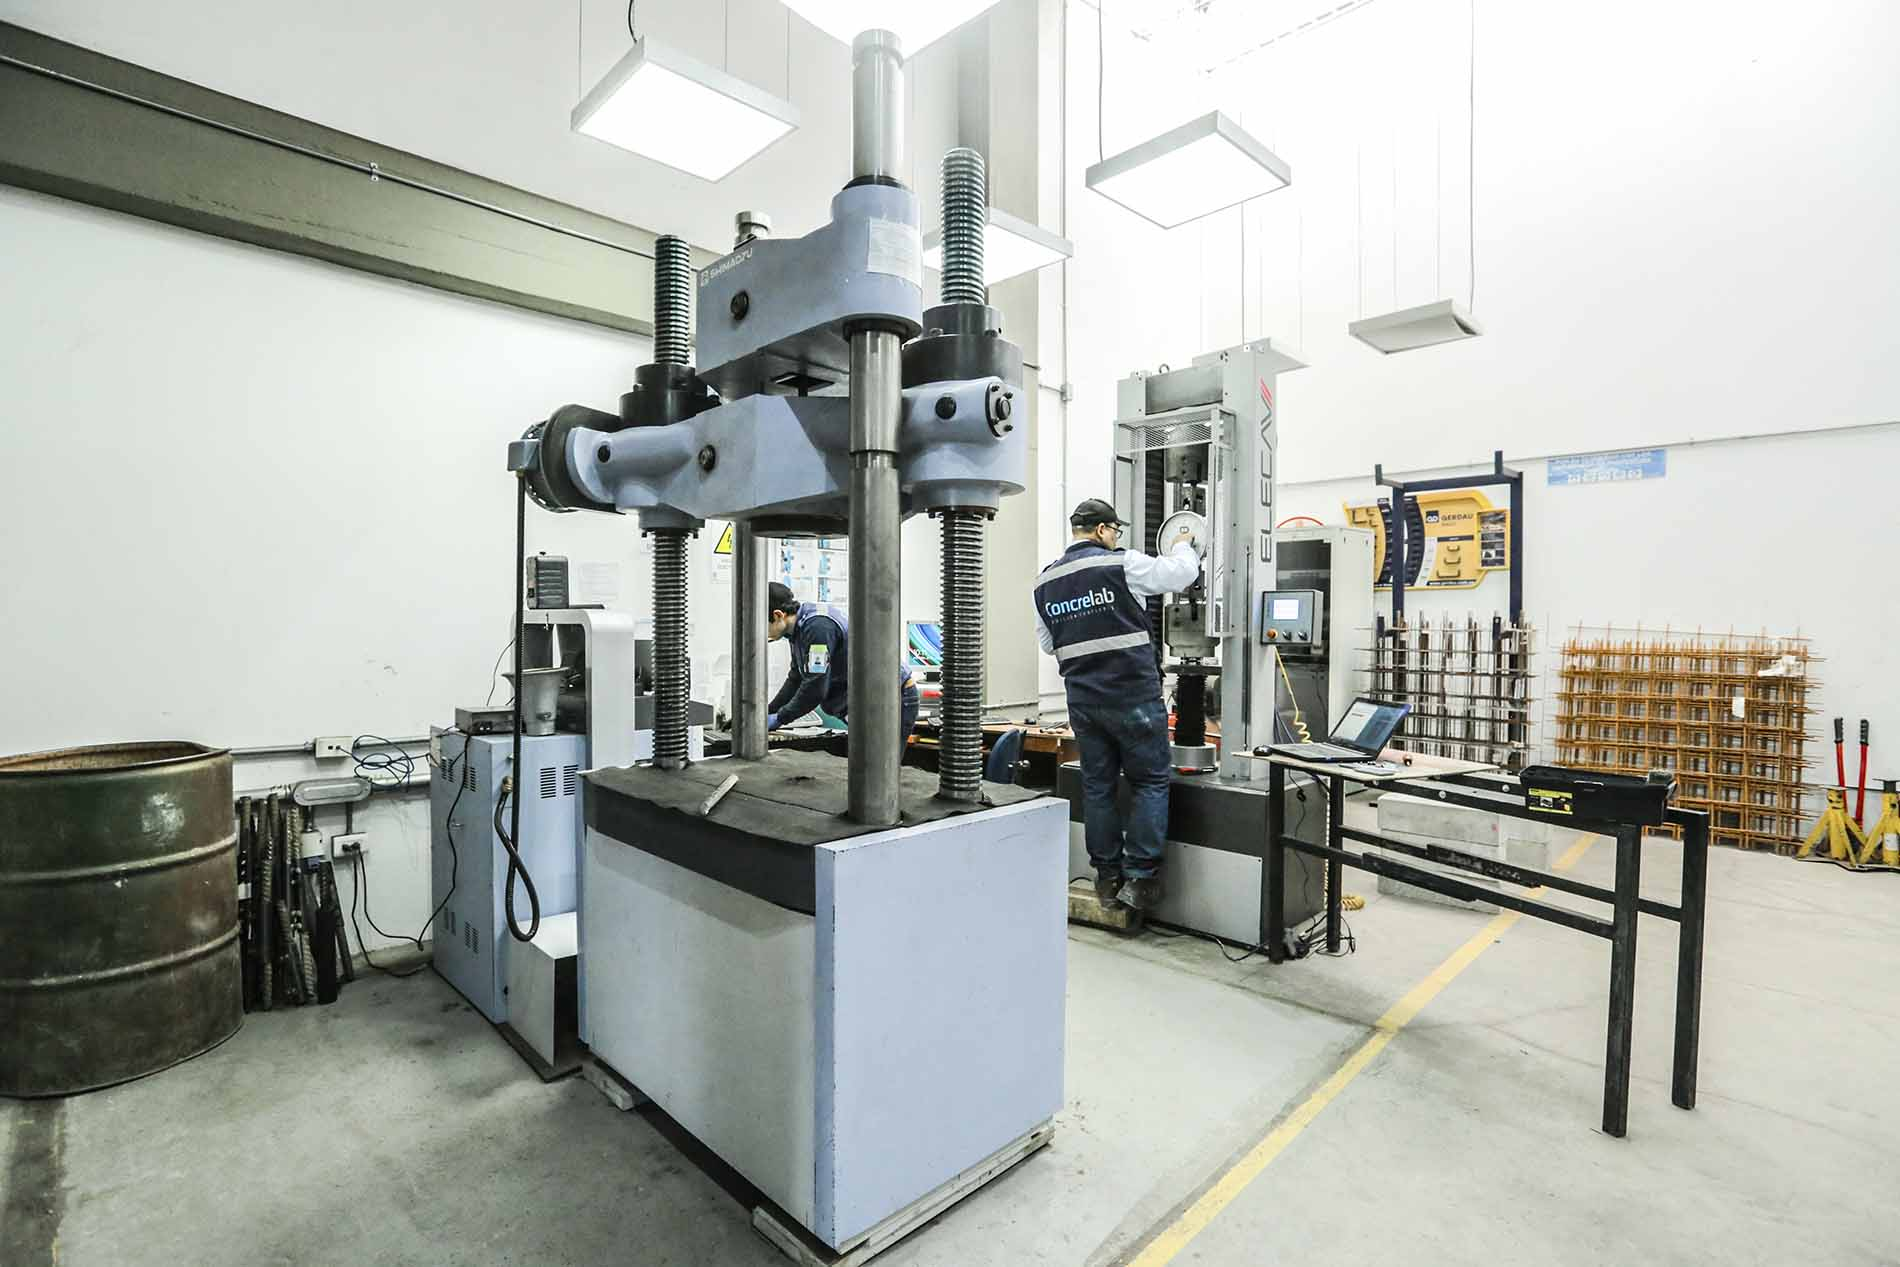 Laboratorio de Ensayos Mecánicos